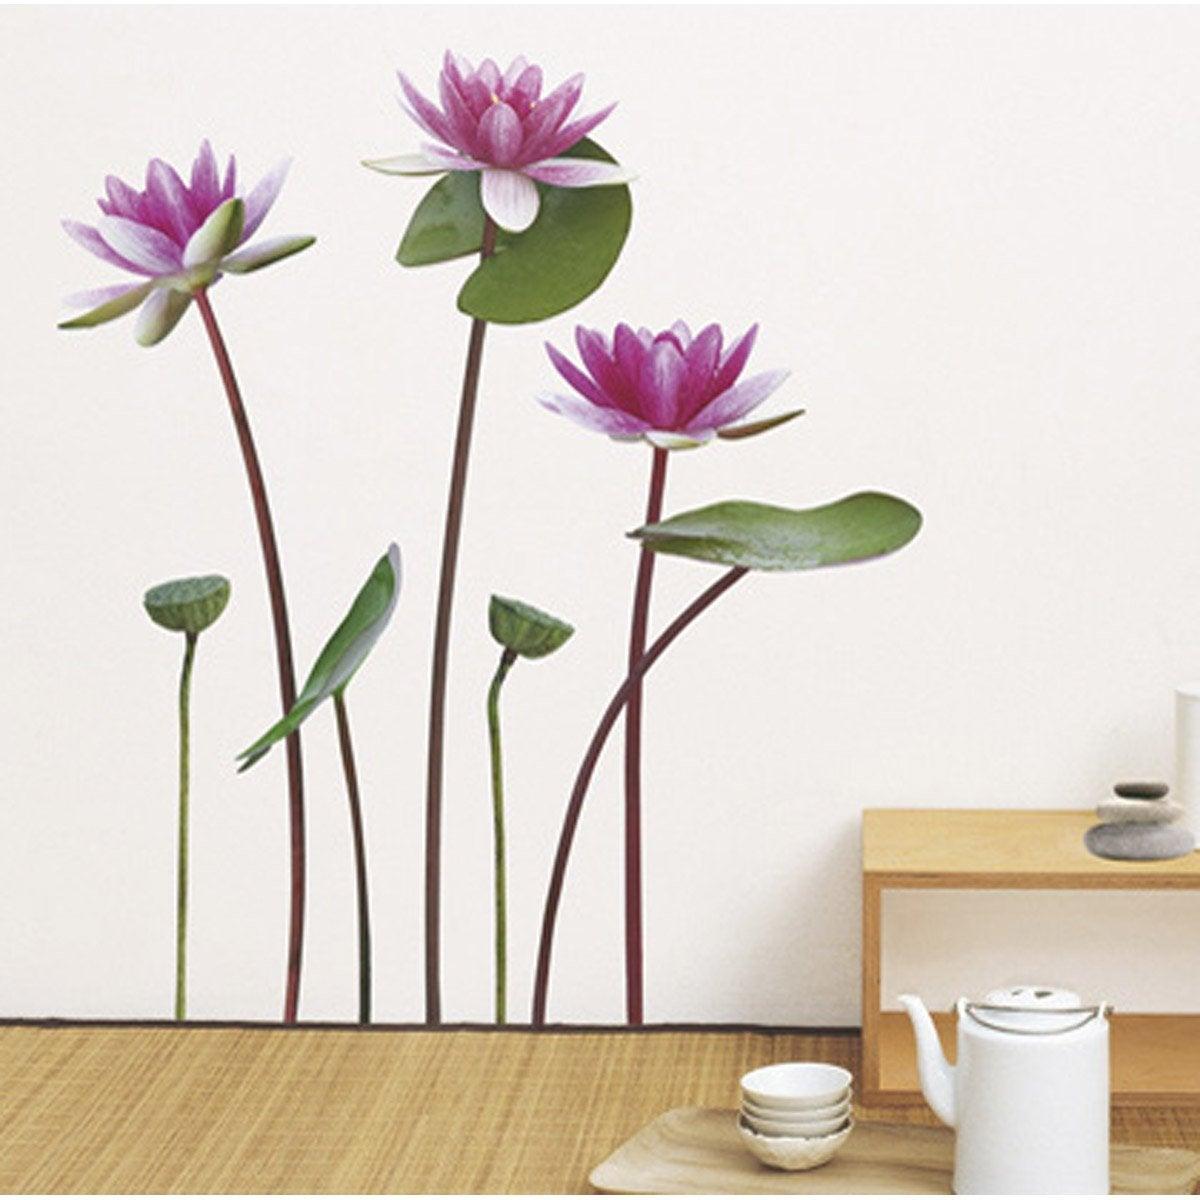 sticker lotus et nymphea 50 cm x 70 cm leroy merlin. Black Bedroom Furniture Sets. Home Design Ideas